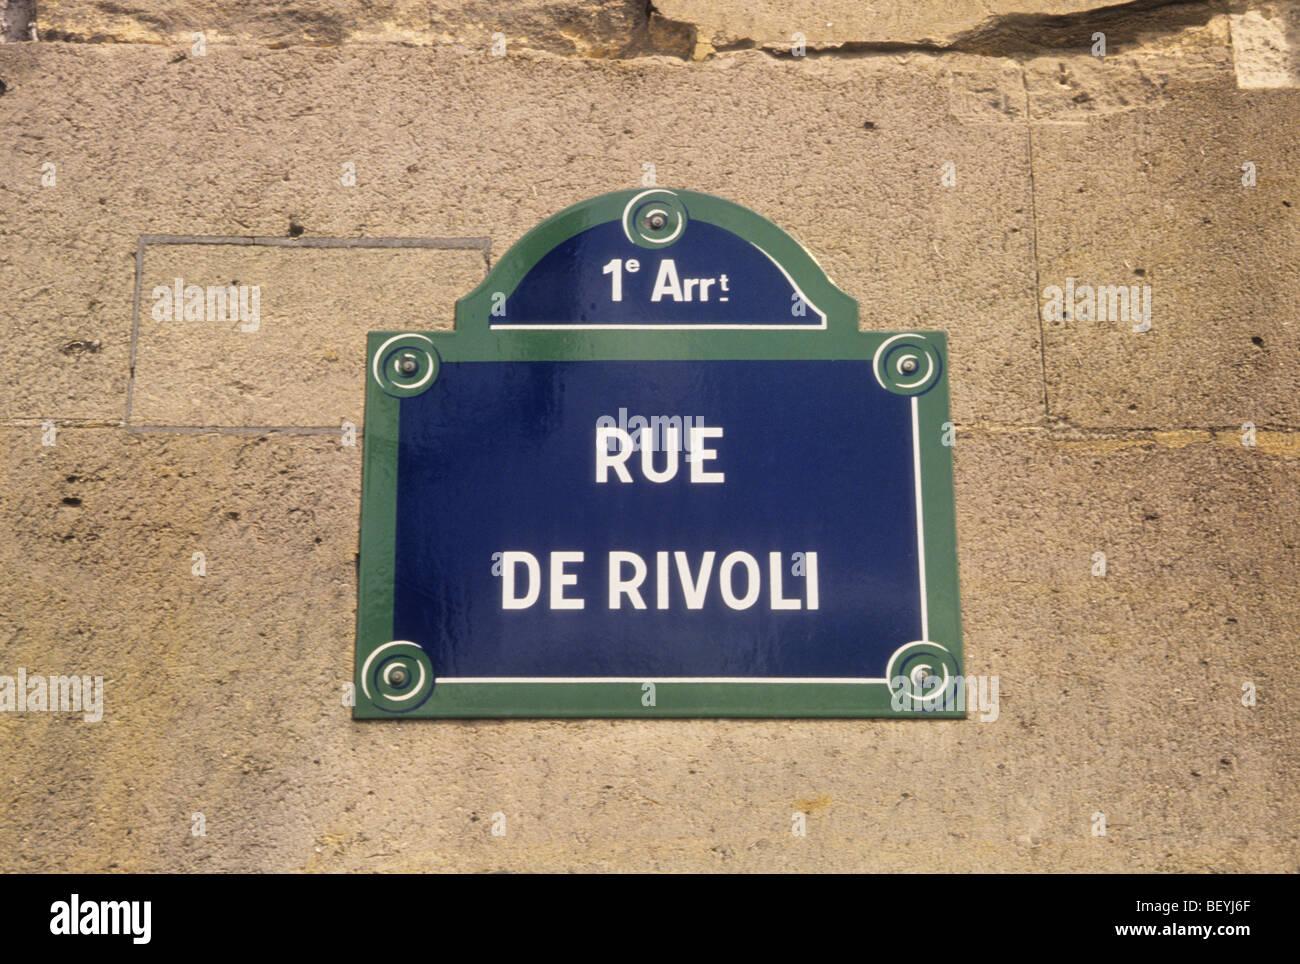 Europe France Paris Rue de Rivoli Street Sign Stock Photo: 26422551